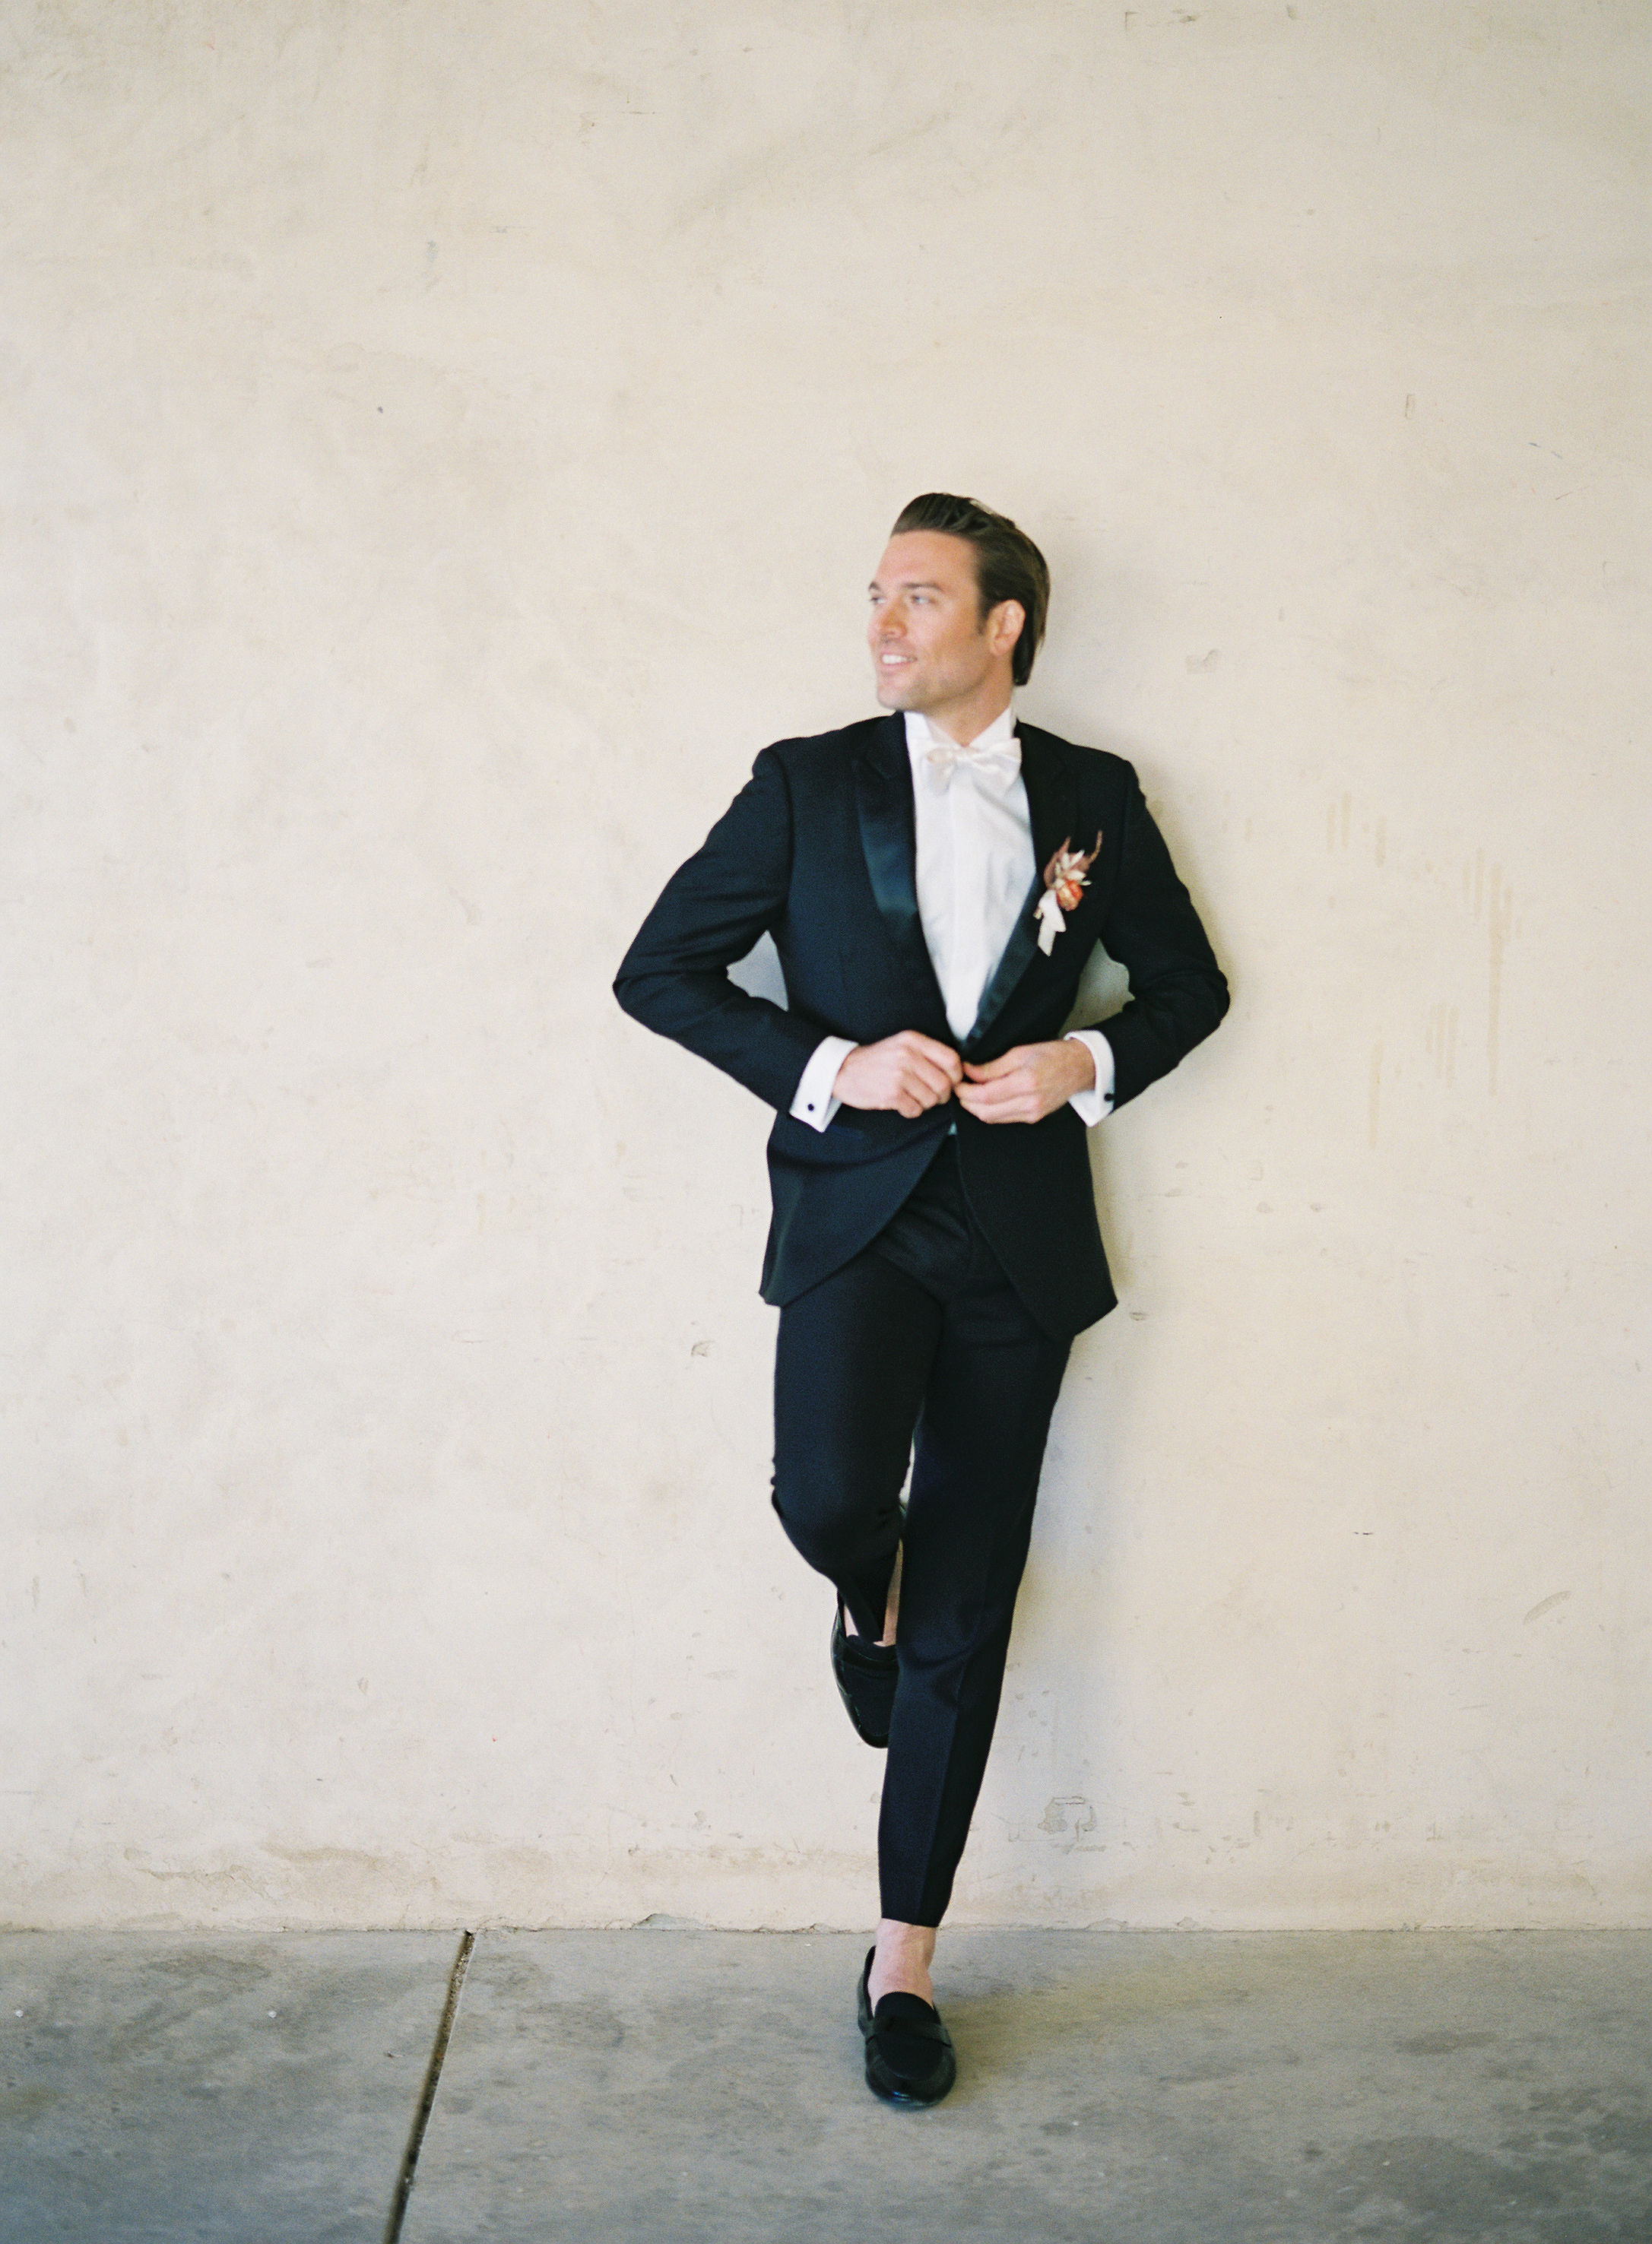 jessica-zimmerman-events-sunstone-groom-black-suit.jpg